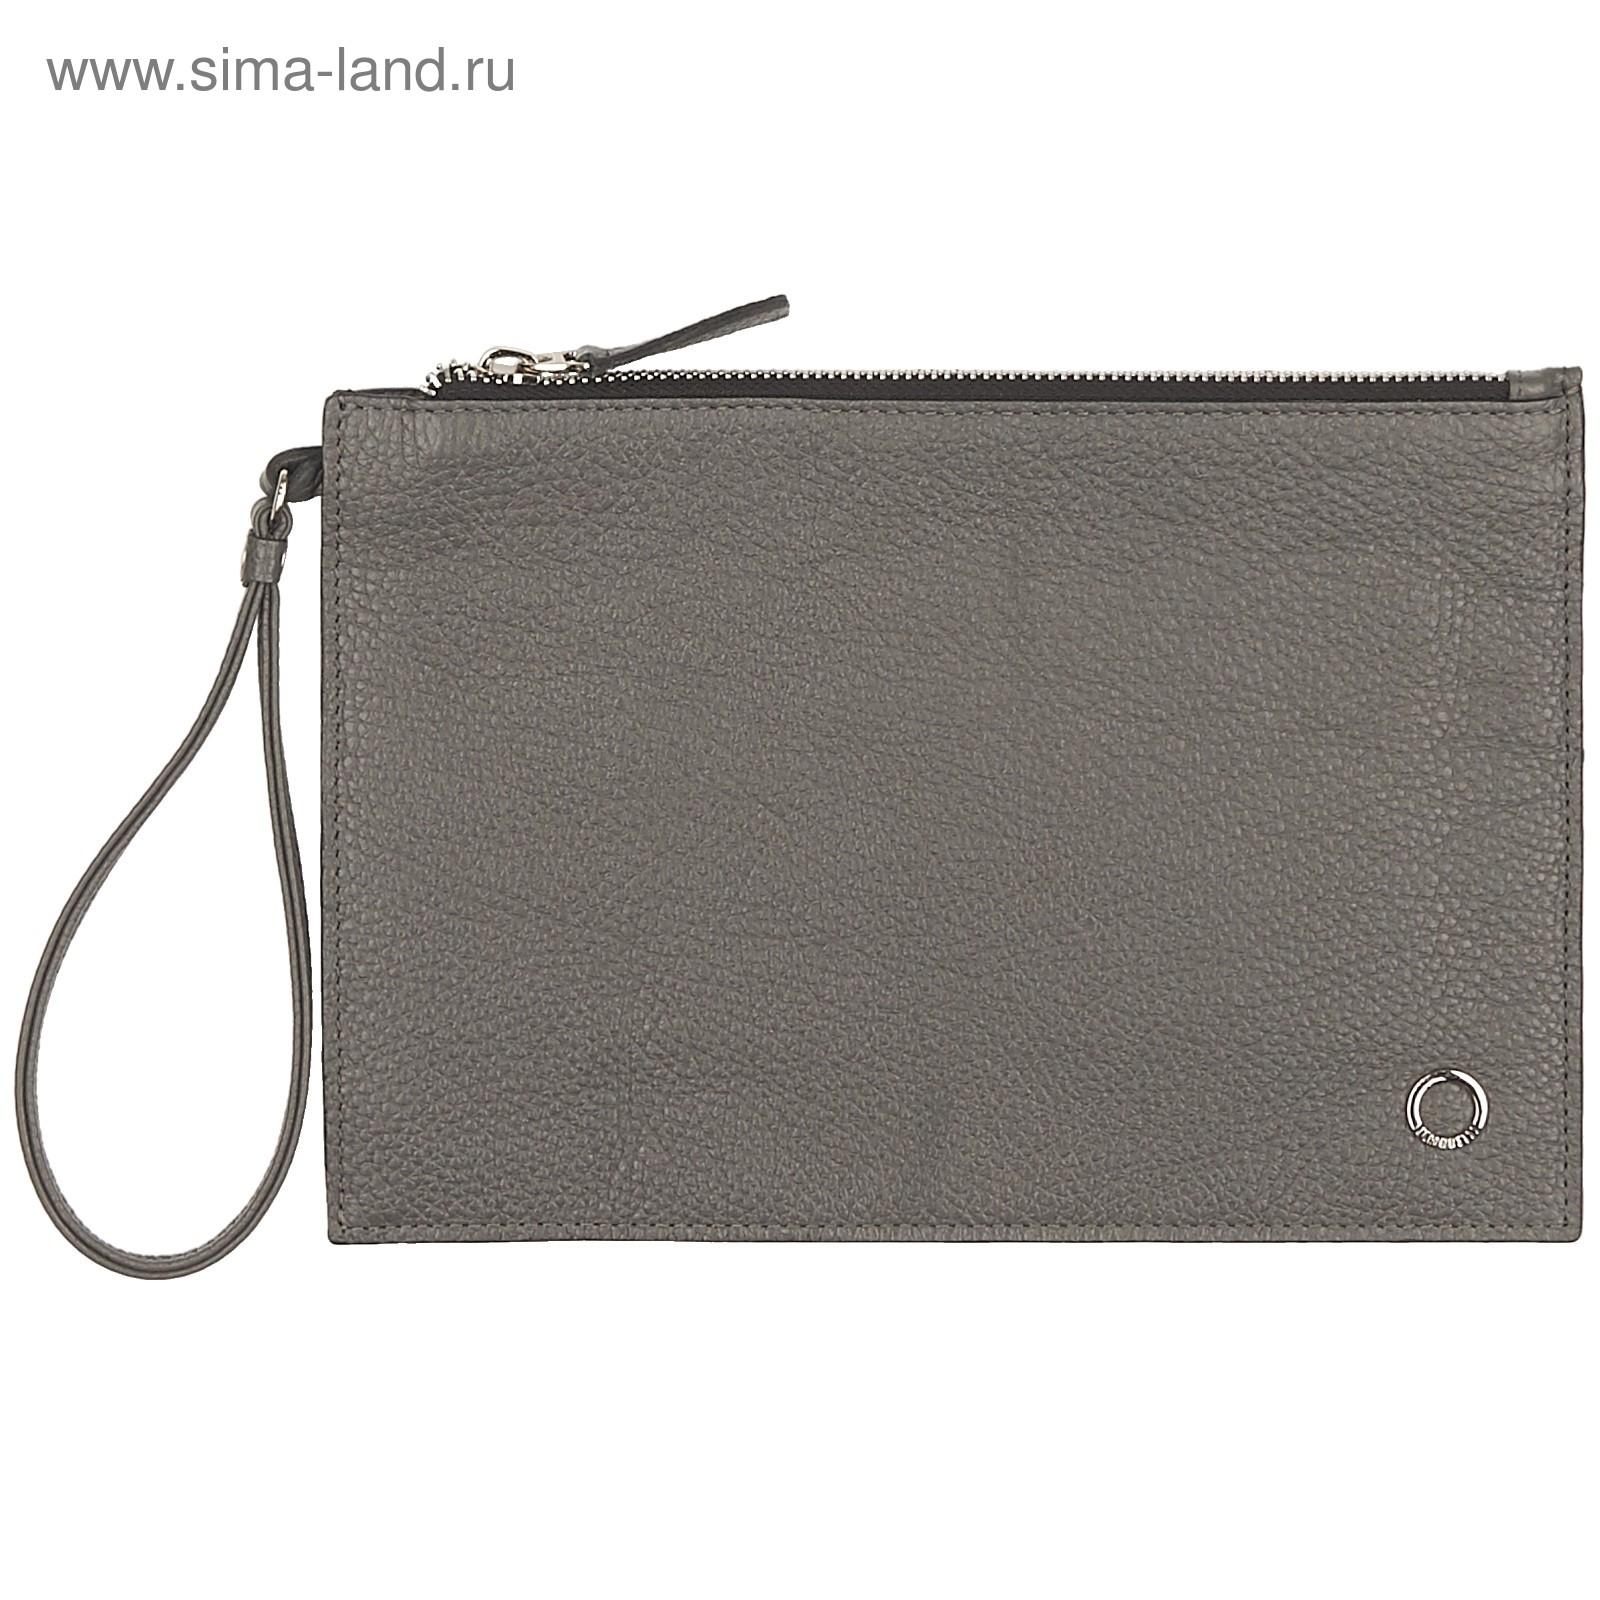 4efab1e44b46 Сумка-конверт, размер 17,4х25 см, цвет серый (DM-SK01-F131) - Купить ...